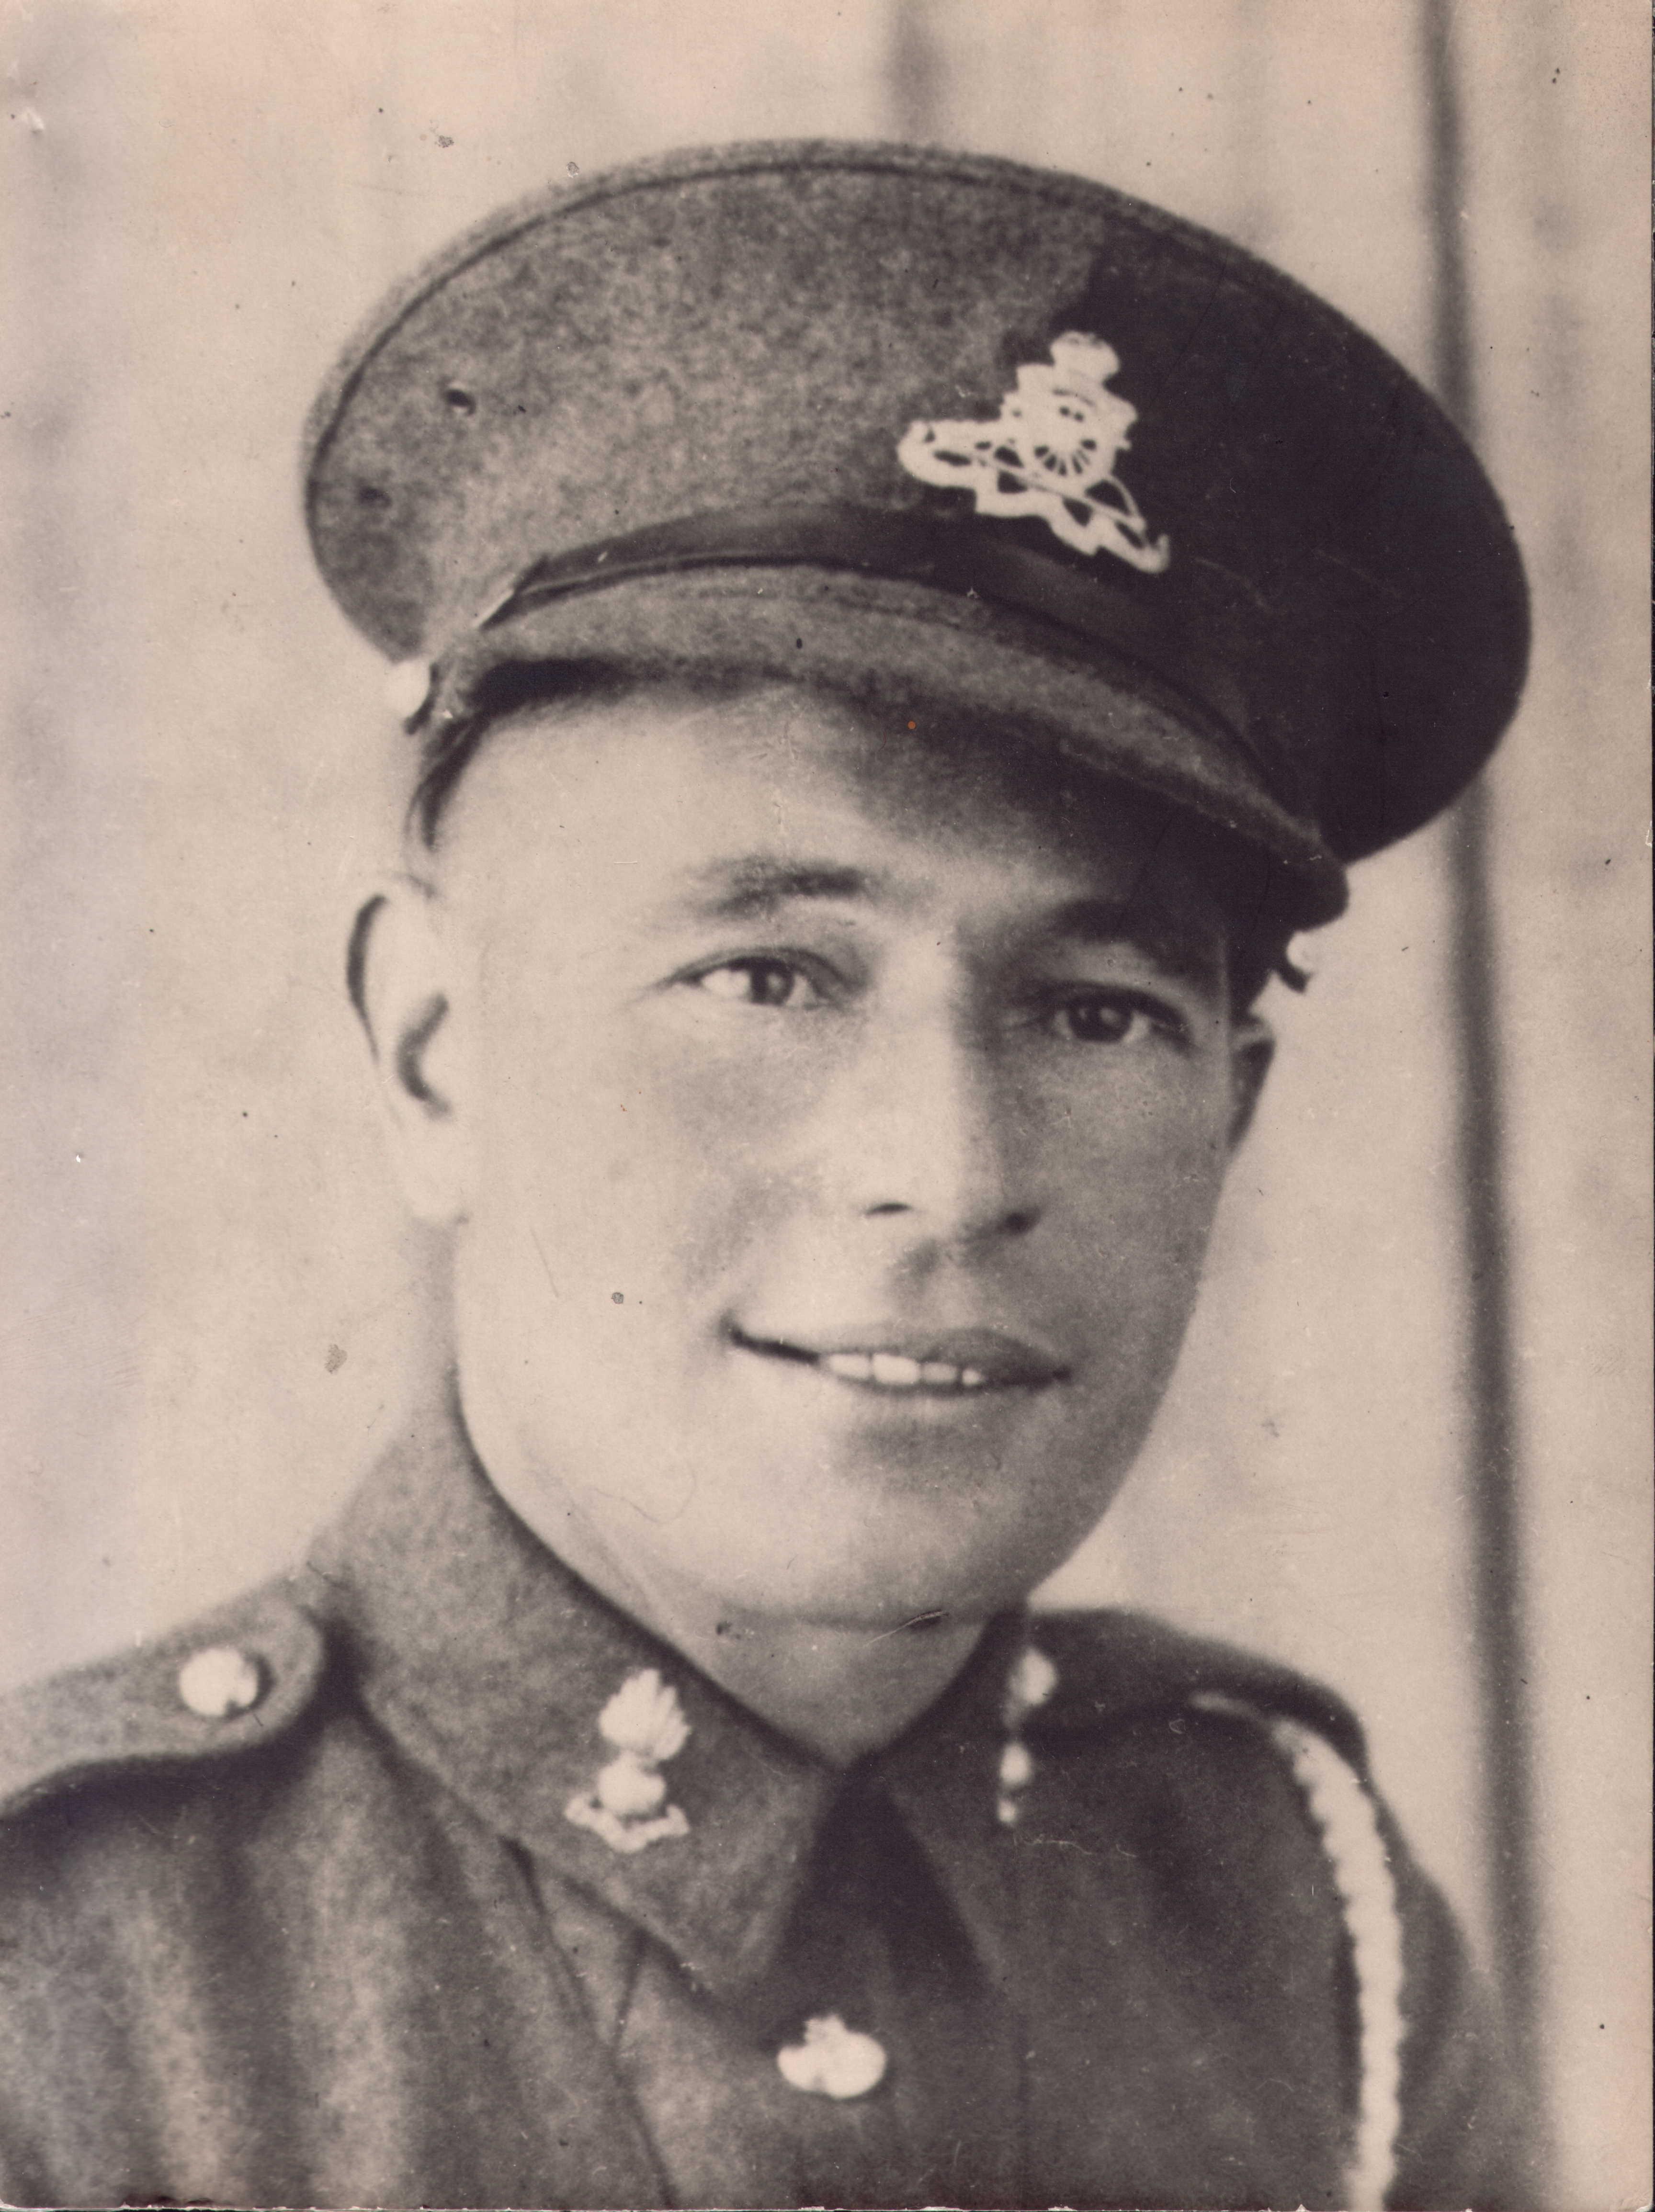 George Lavey. Harry Richard Lavey - 027